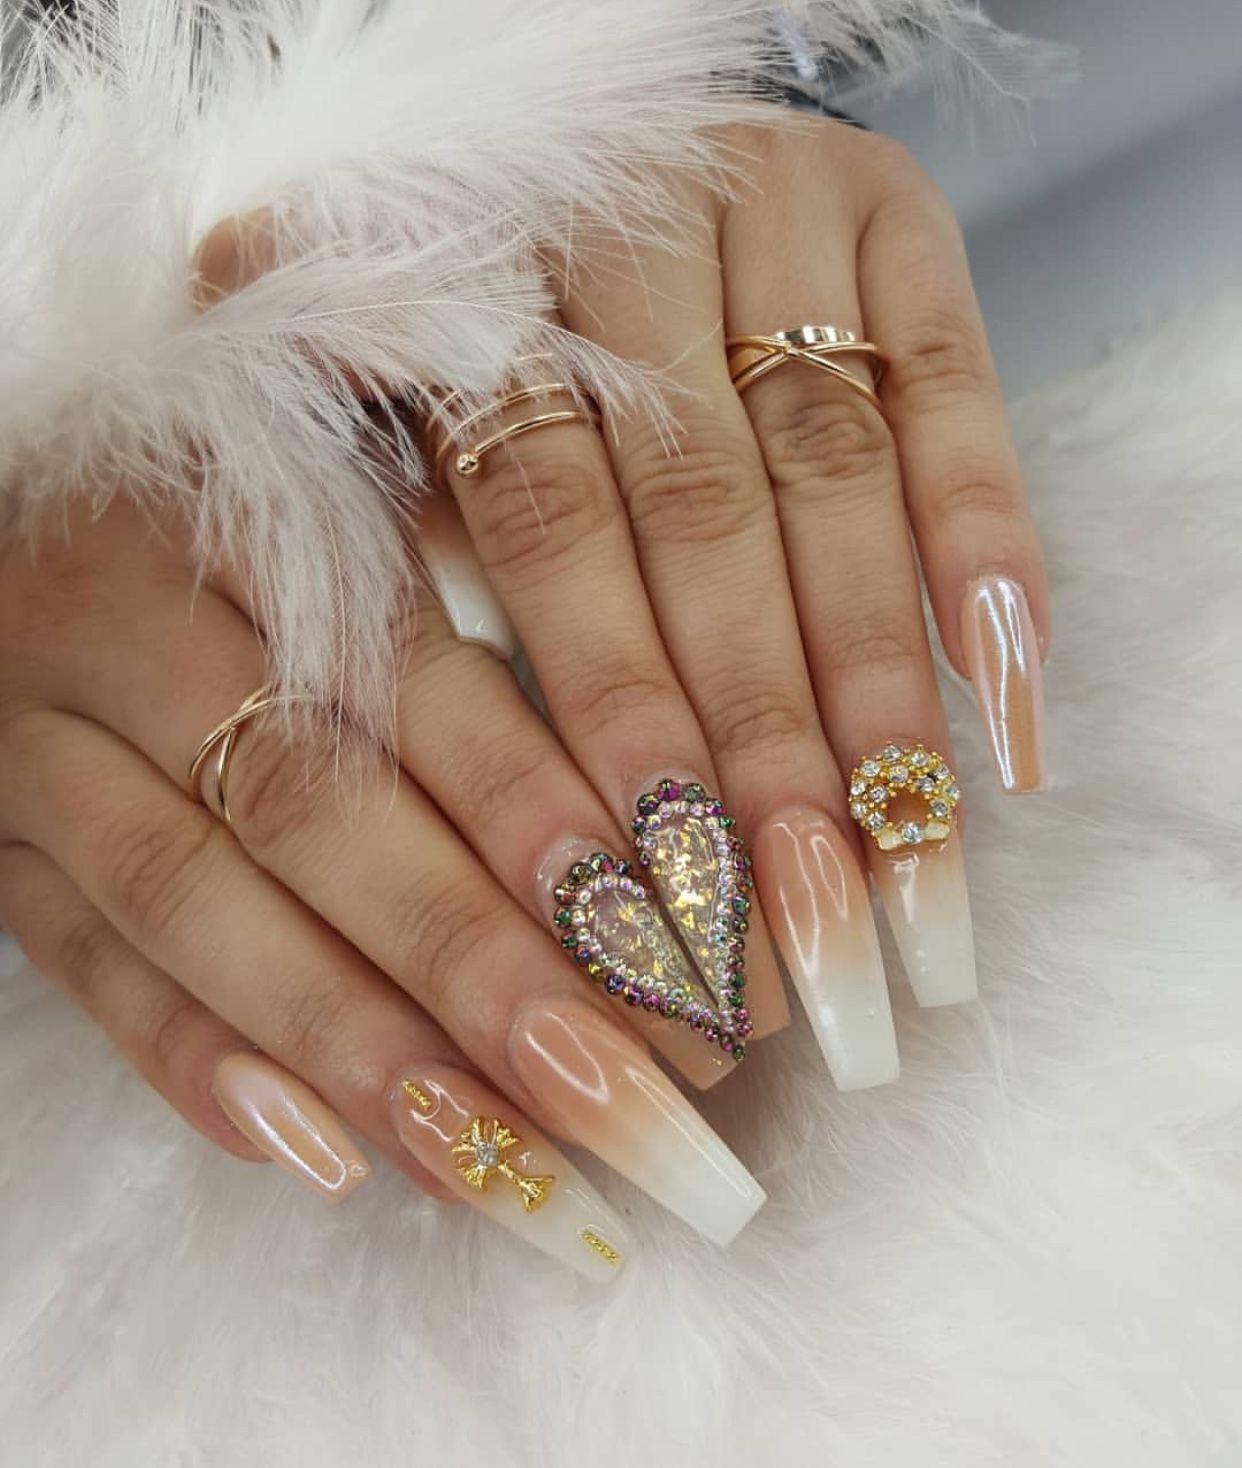 Pin By Annie K On Nails Blogger Nails Long Gel Nails Nails